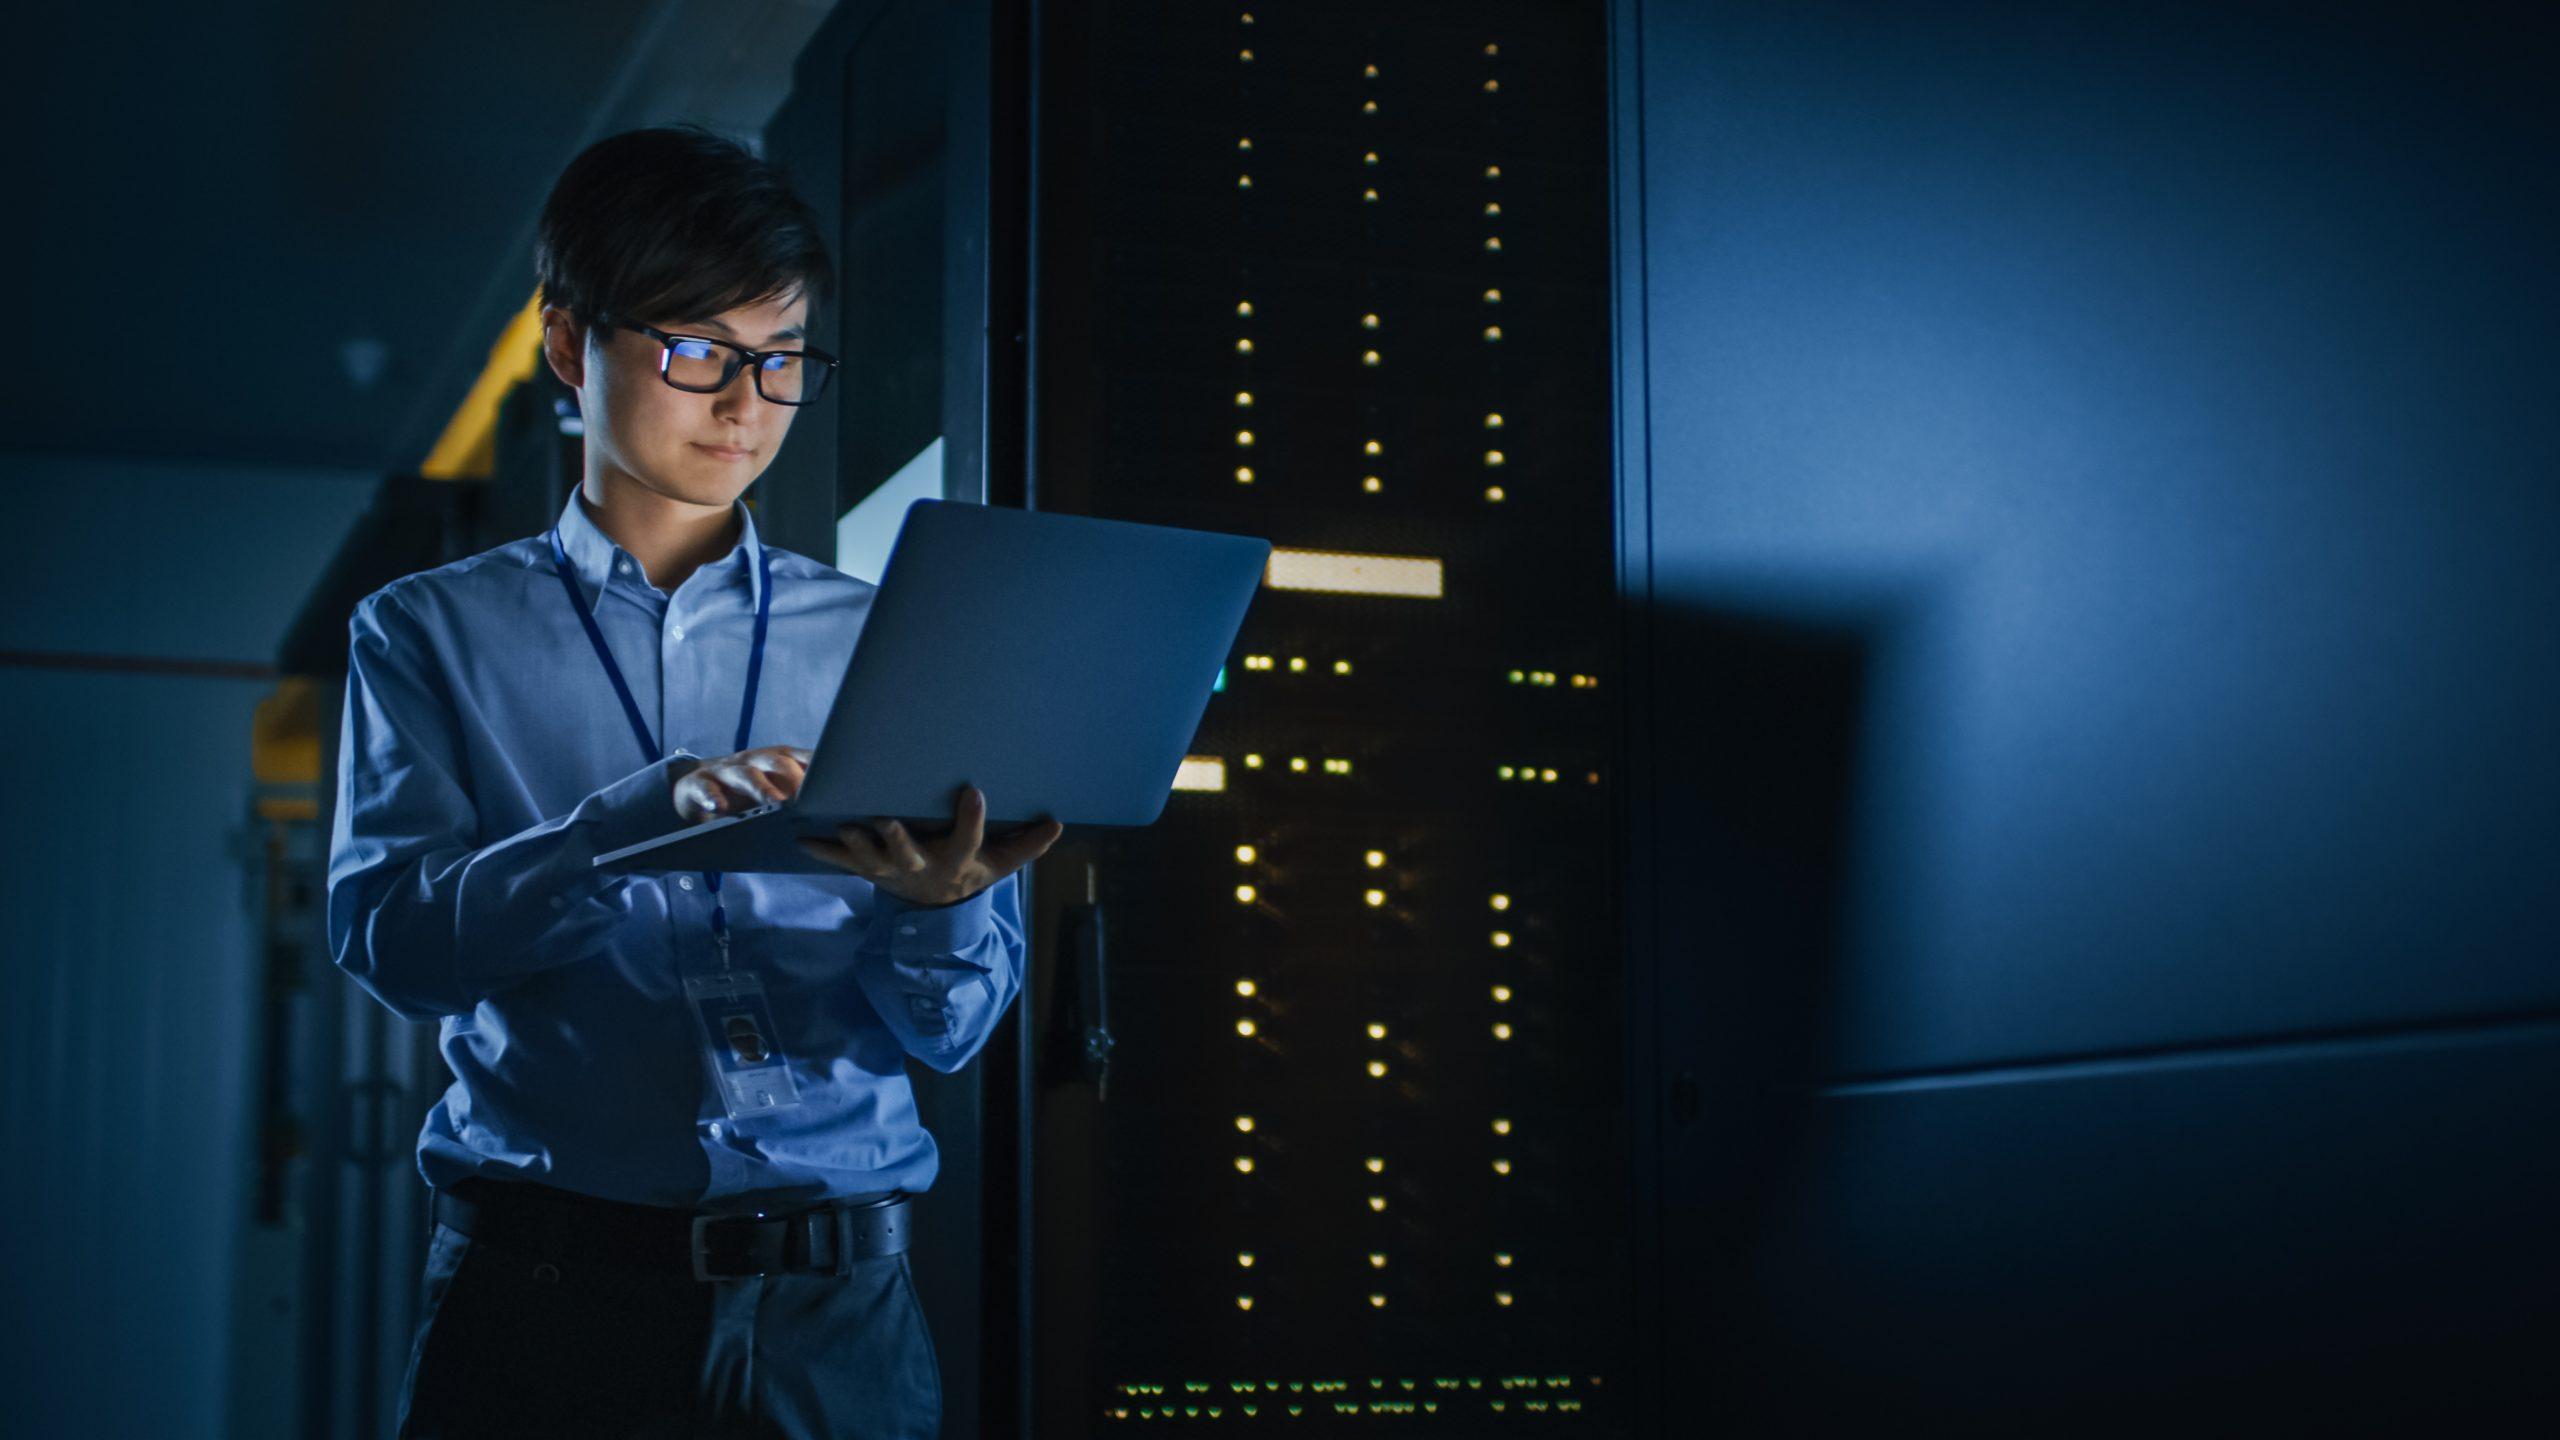 IT Specialist in Data Center